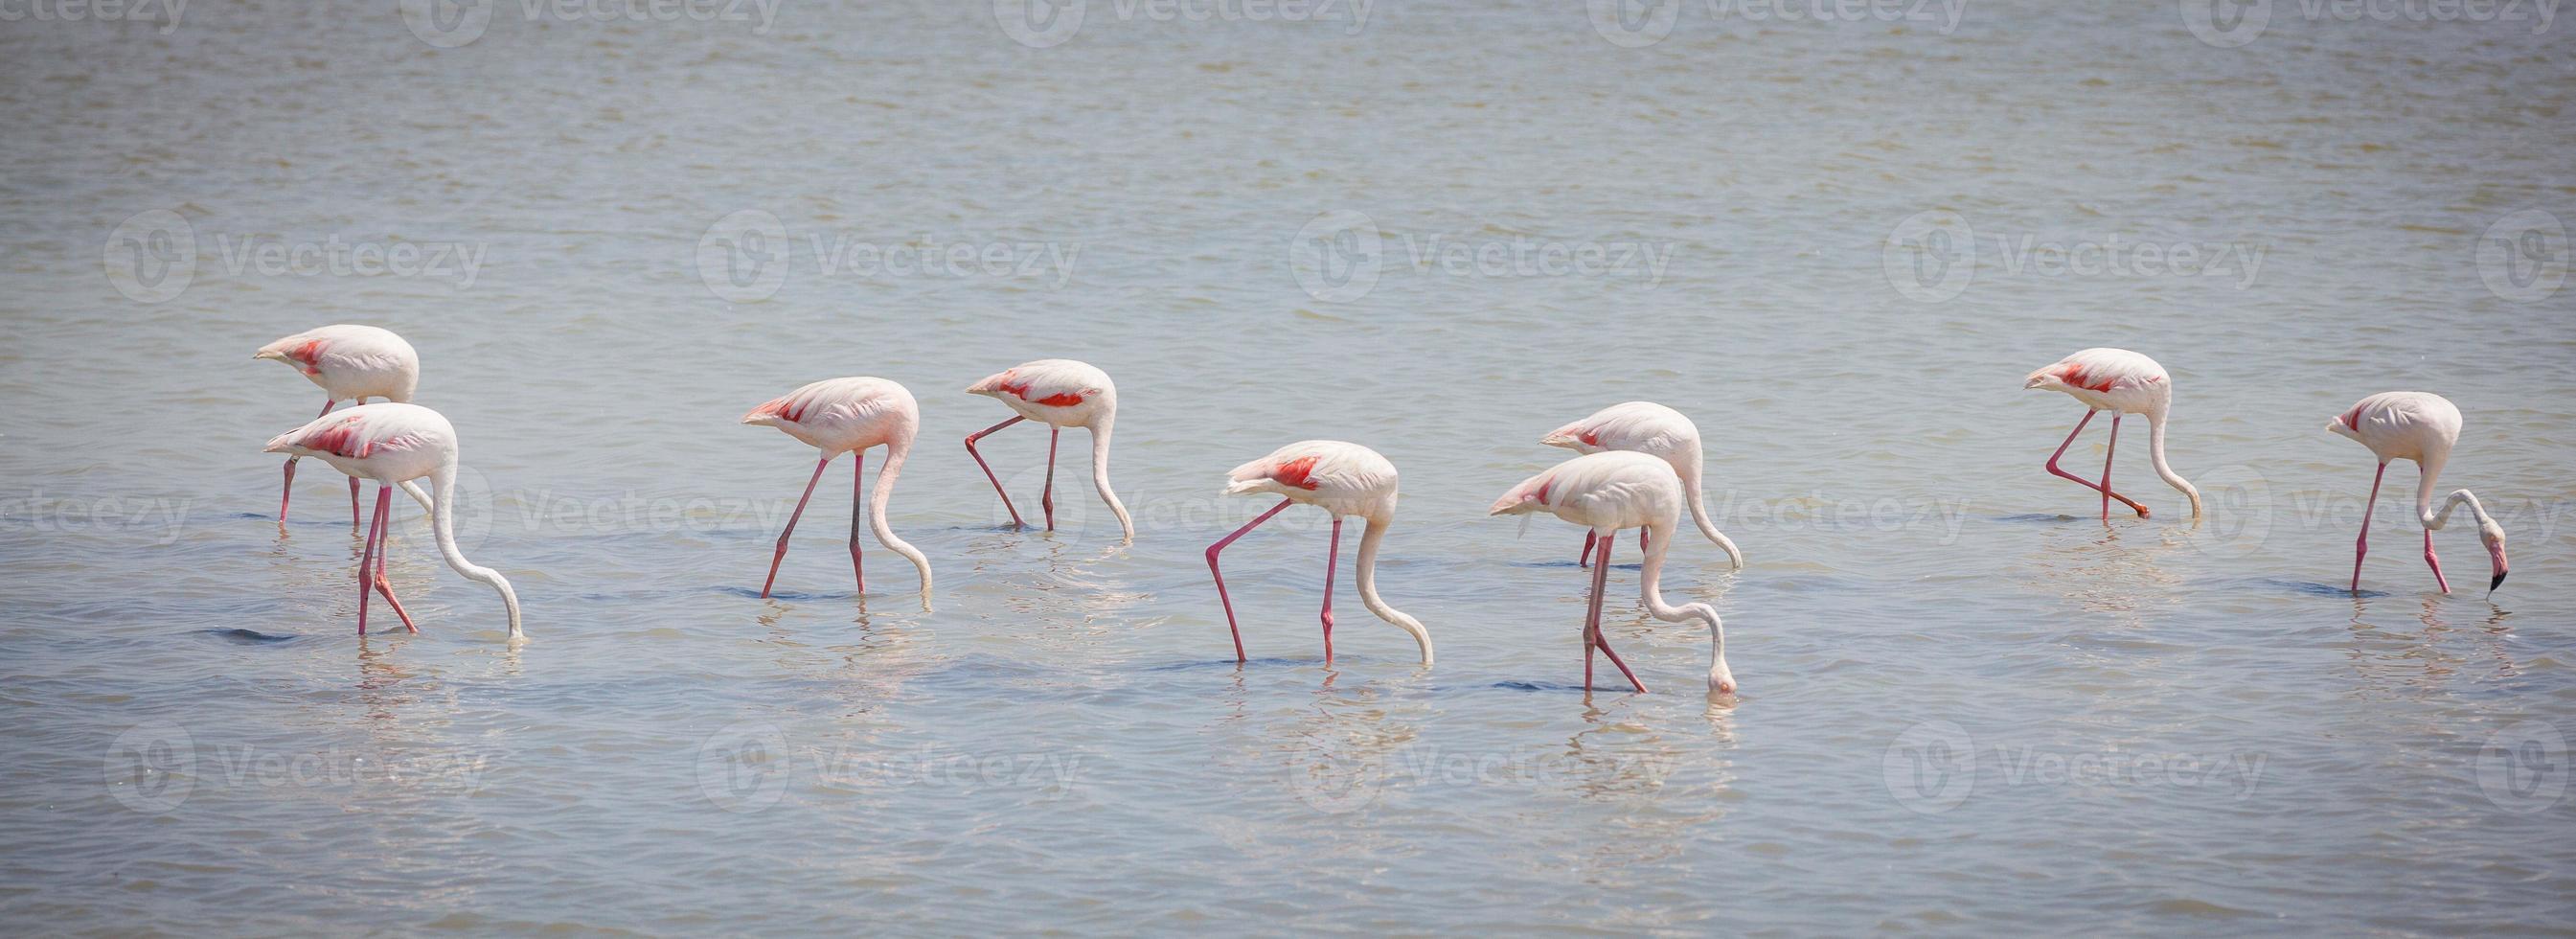 Flamingos Camargue Provence photo